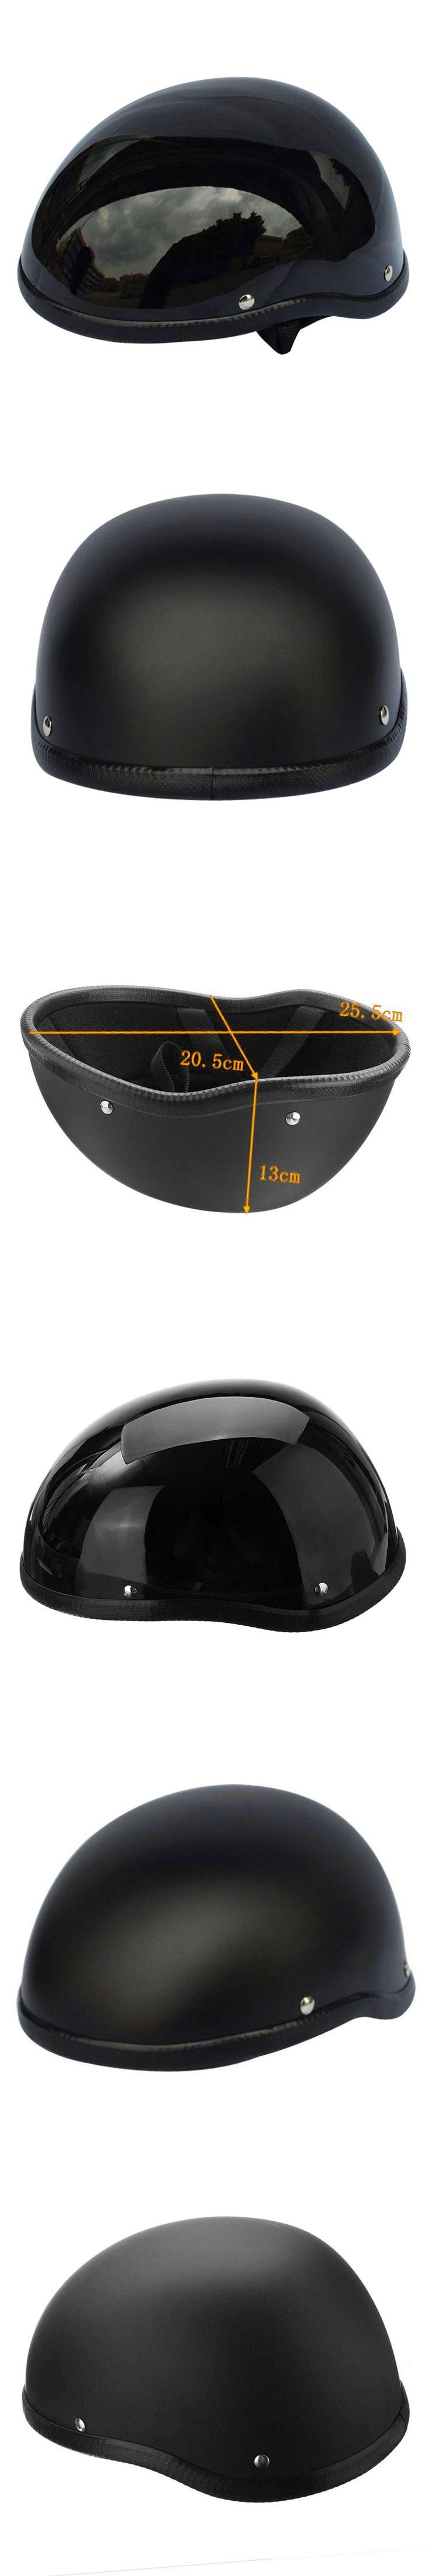 Half Helmet 57-62cm For Skate Bicycle Motorcycle Skateboard Helm Motorcross Capacete Retro Matte Black ABS Plastic For Men Women